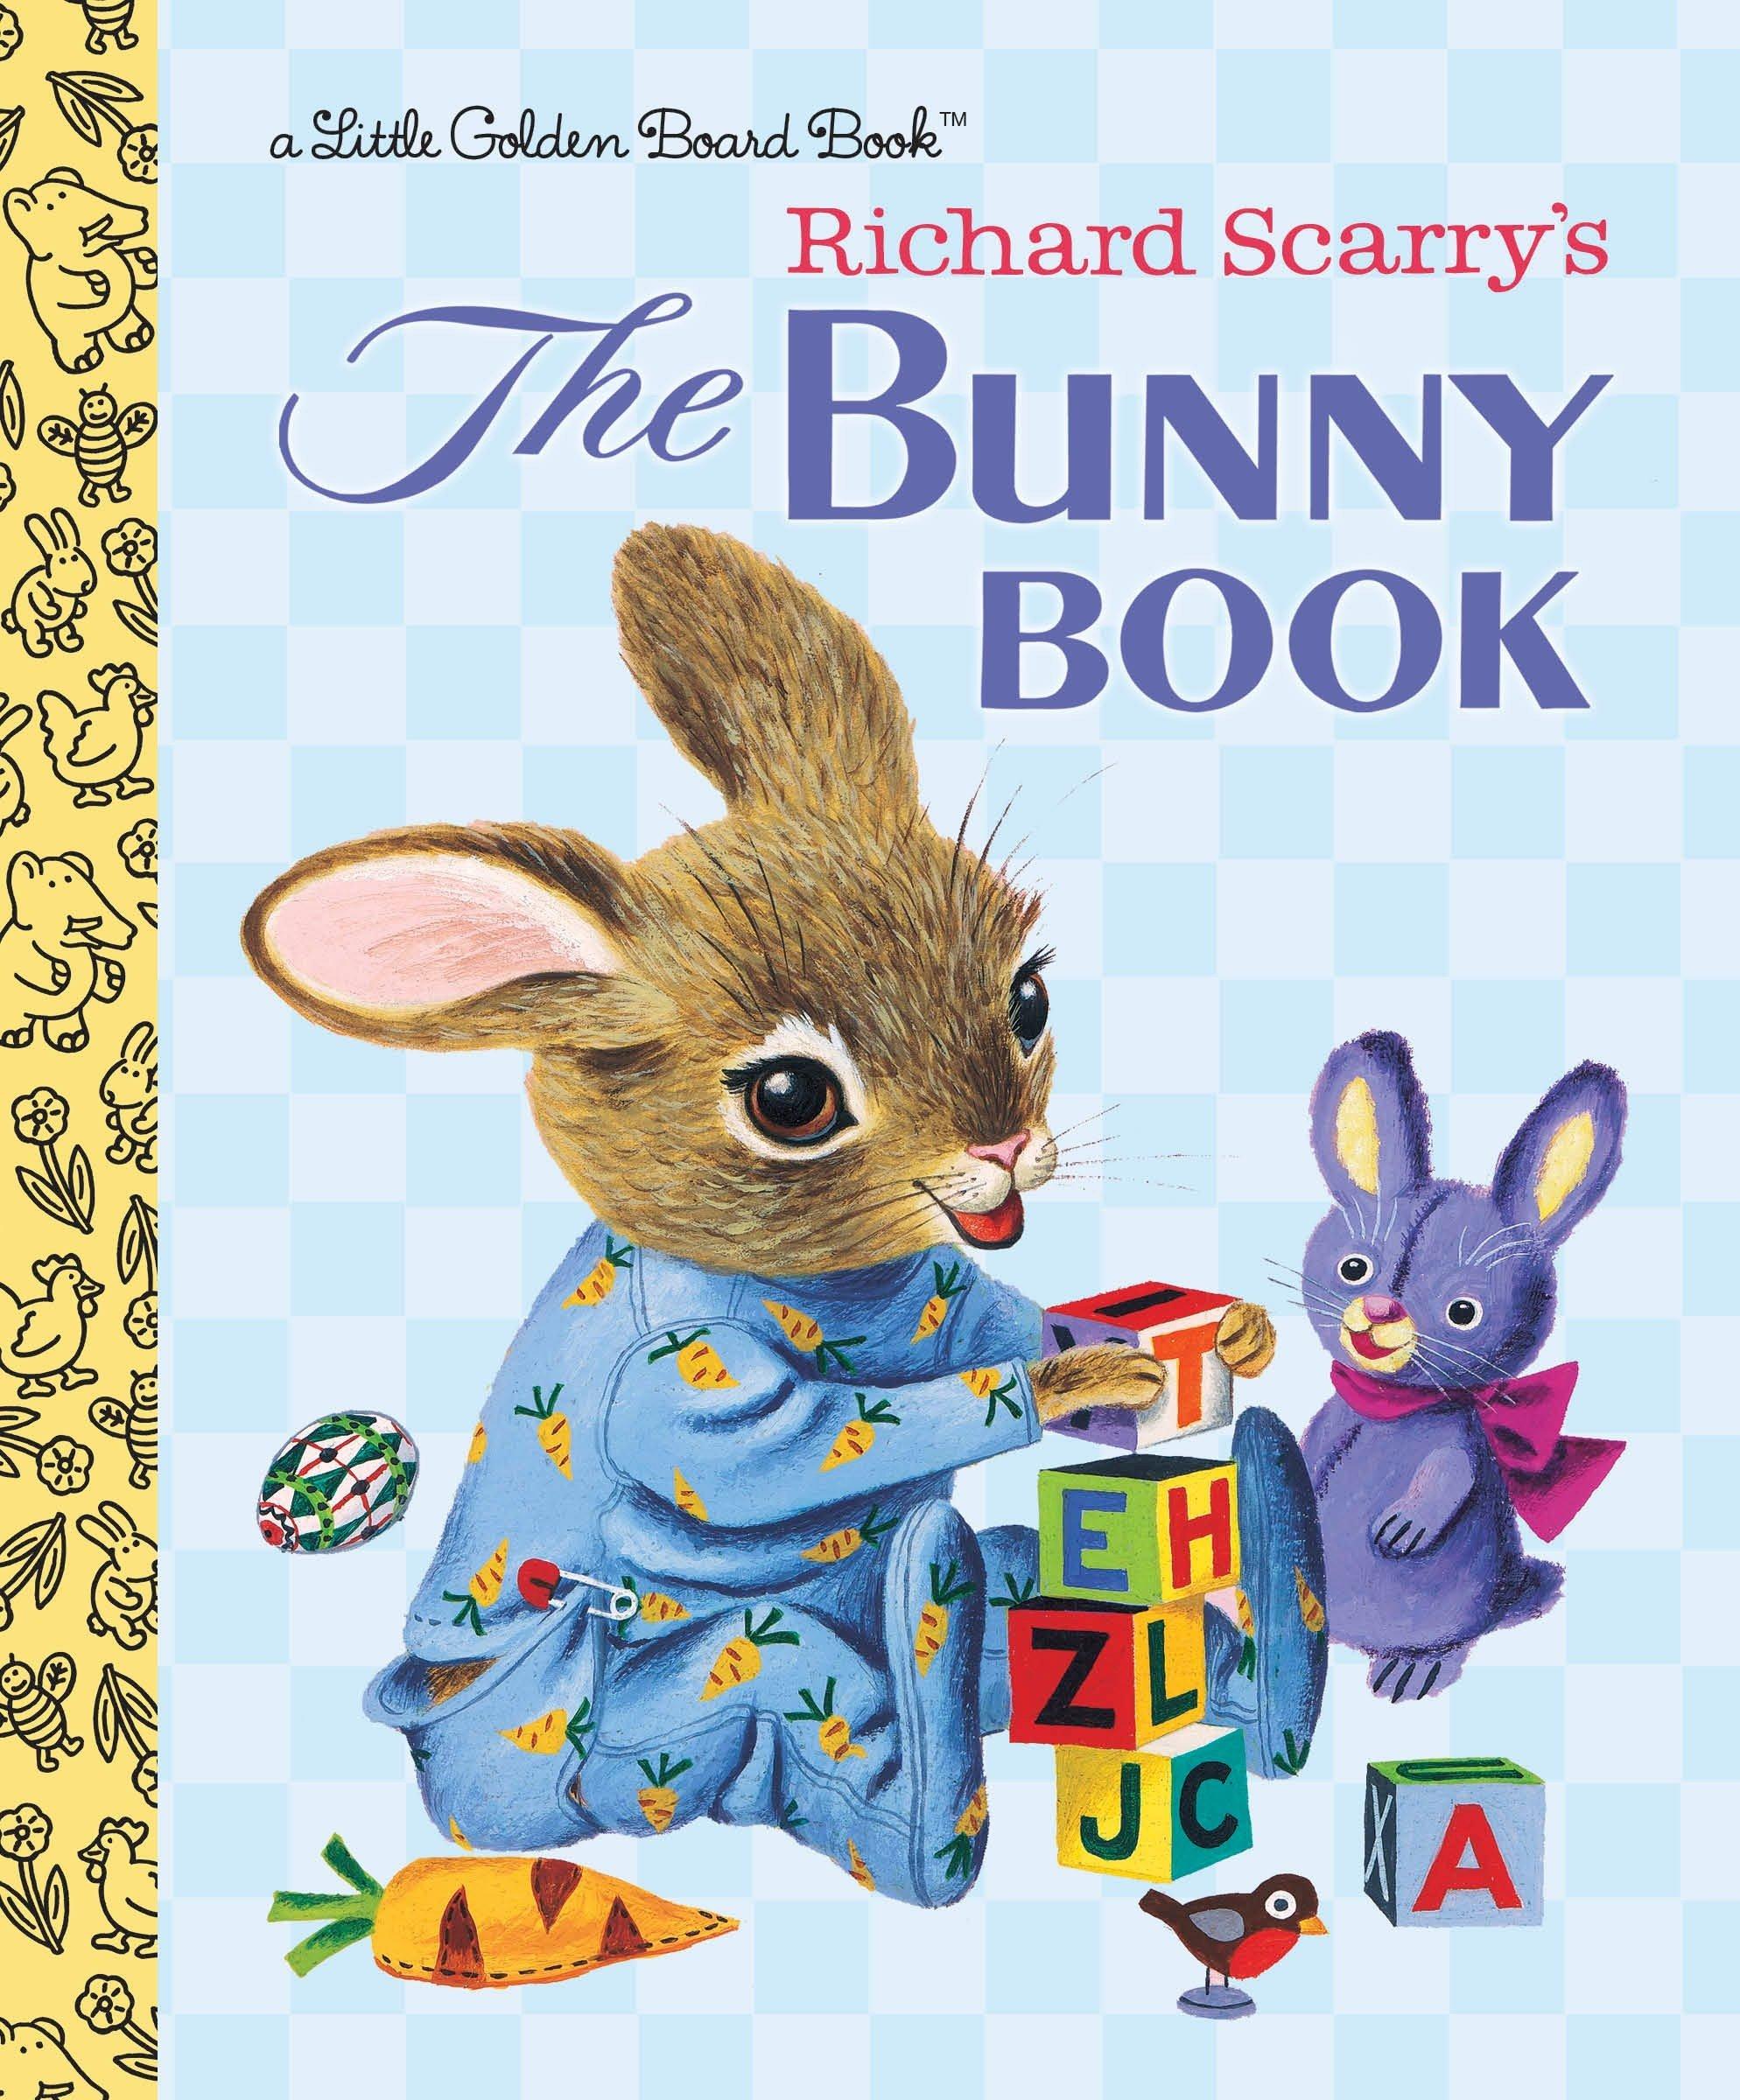 BUNNY BOOK, THE ebook